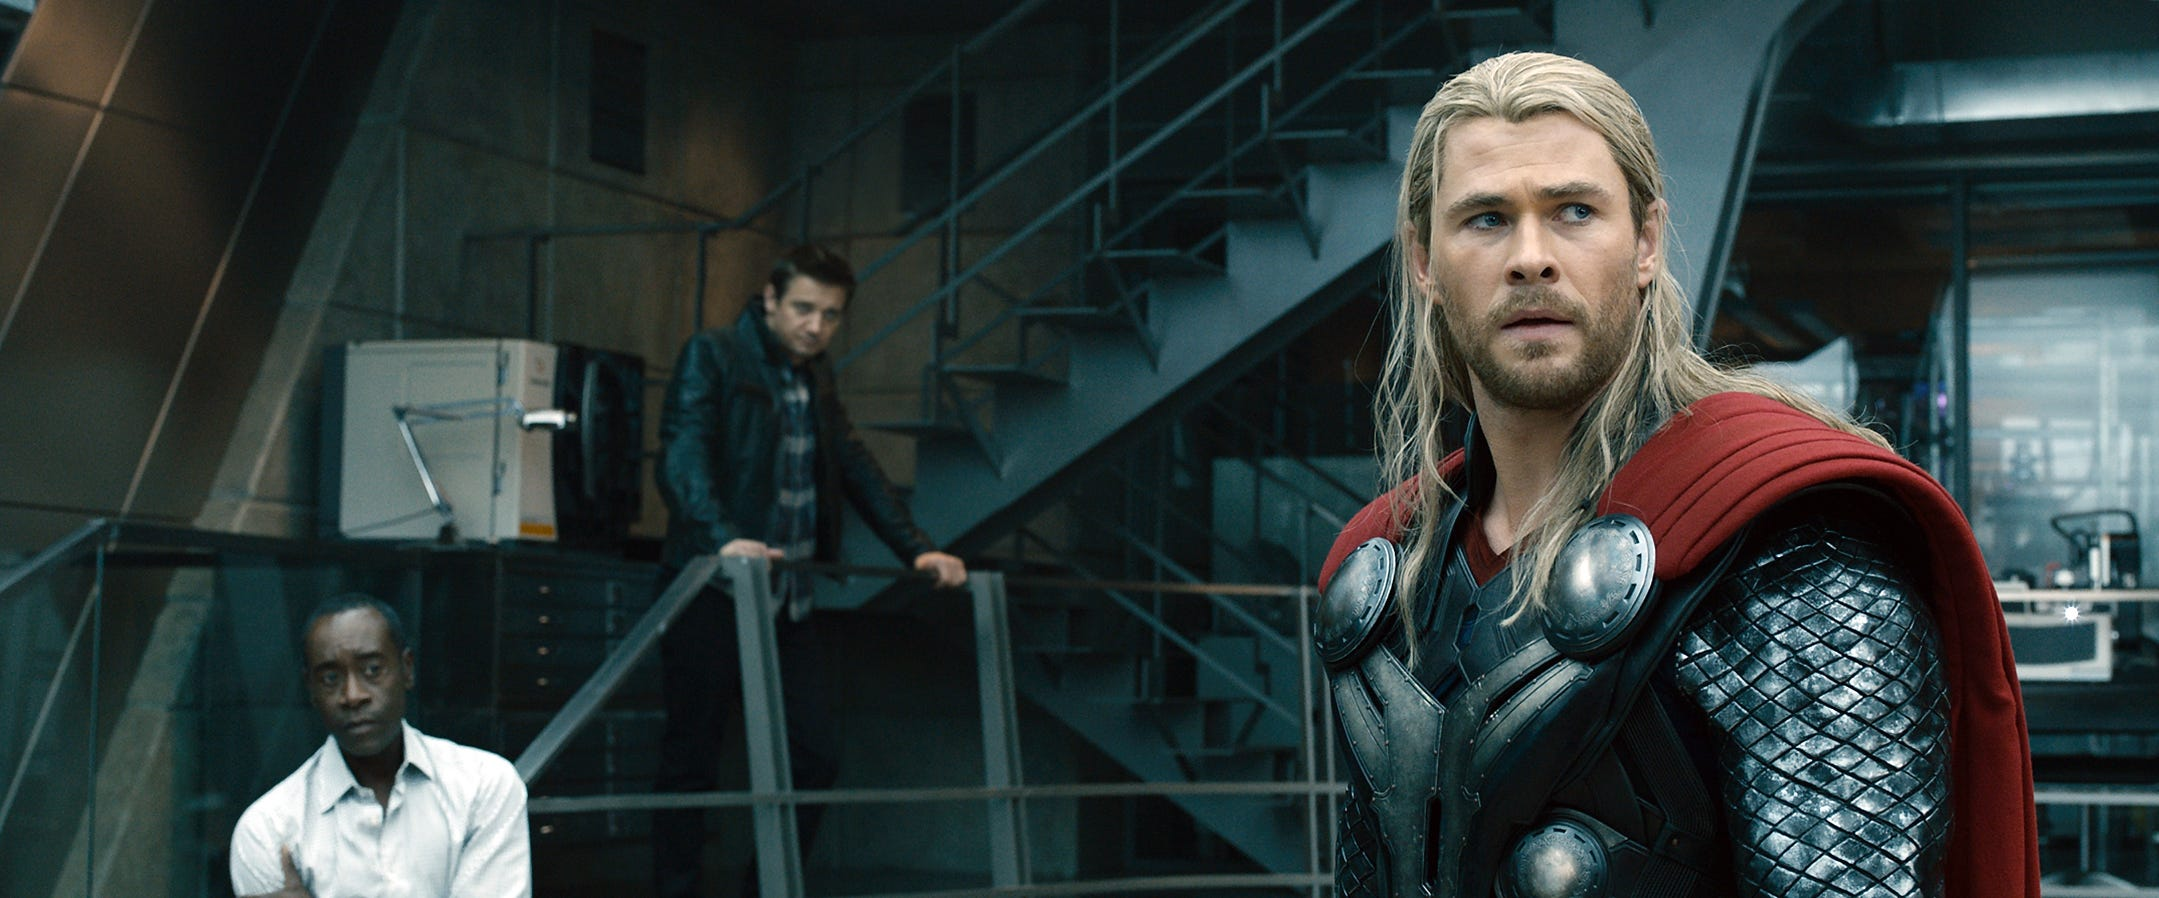 Norse God Thor Avengers Endgame